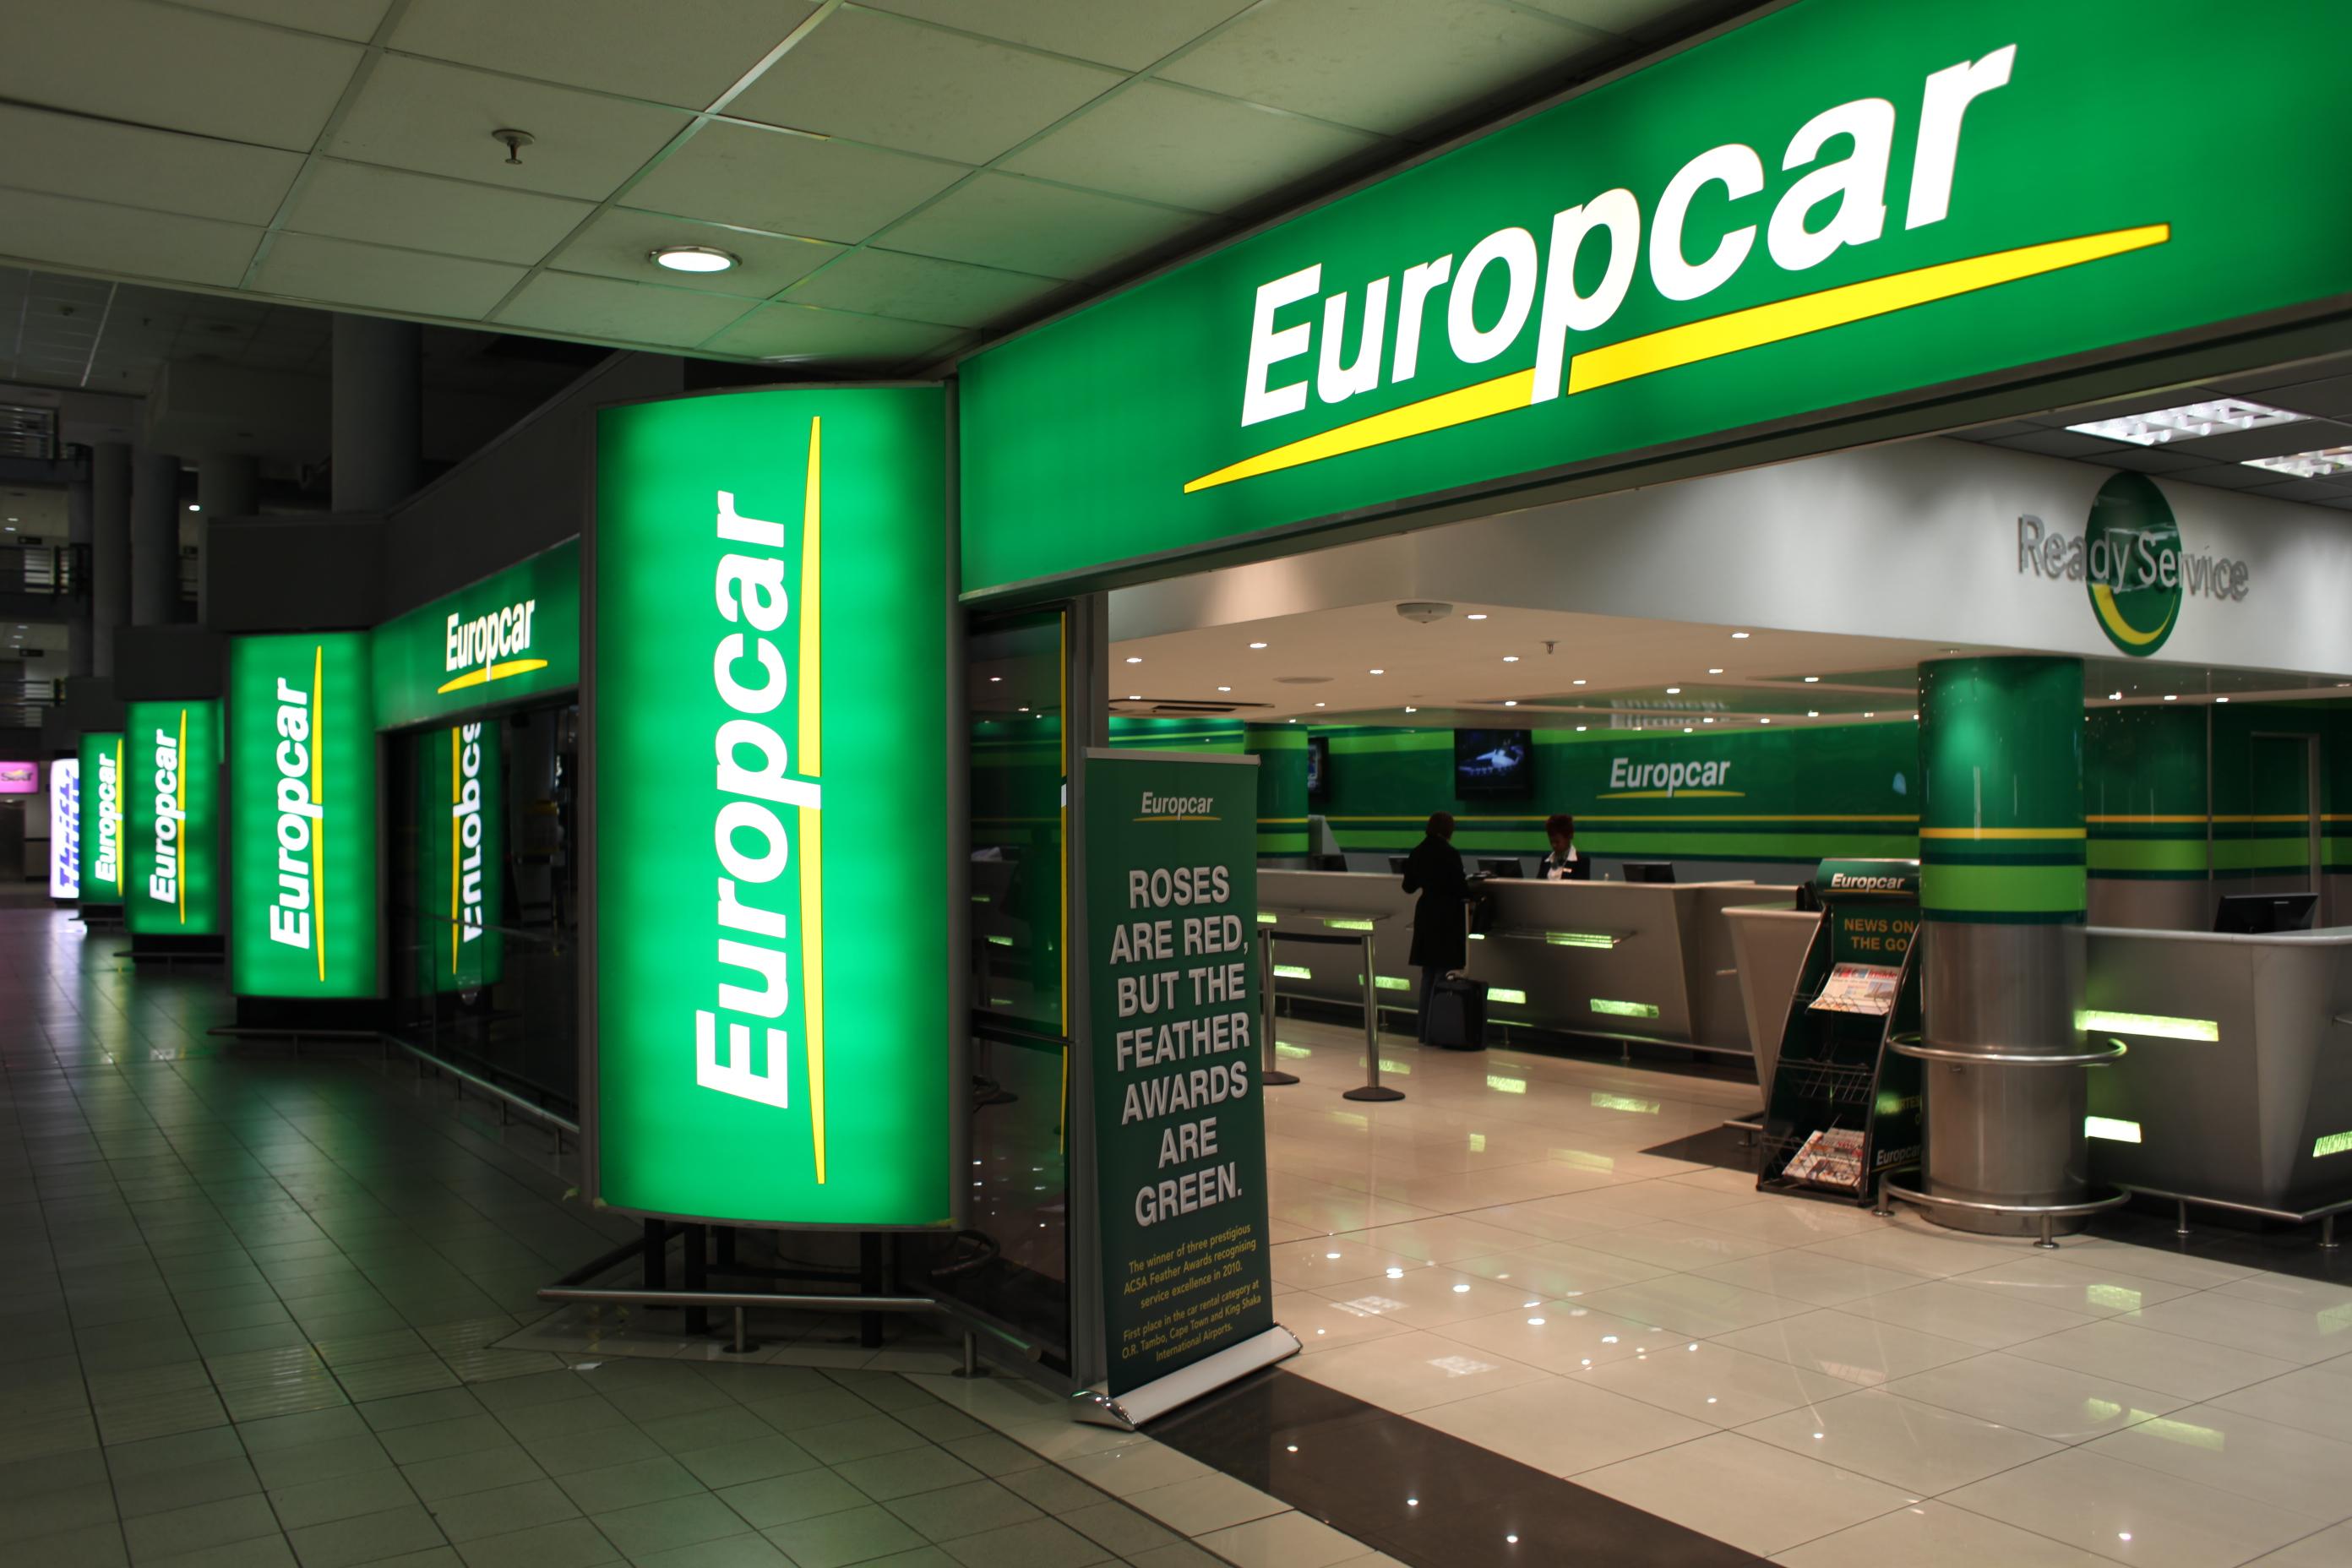 Europe Car: Europcar Johannesburg Reservations